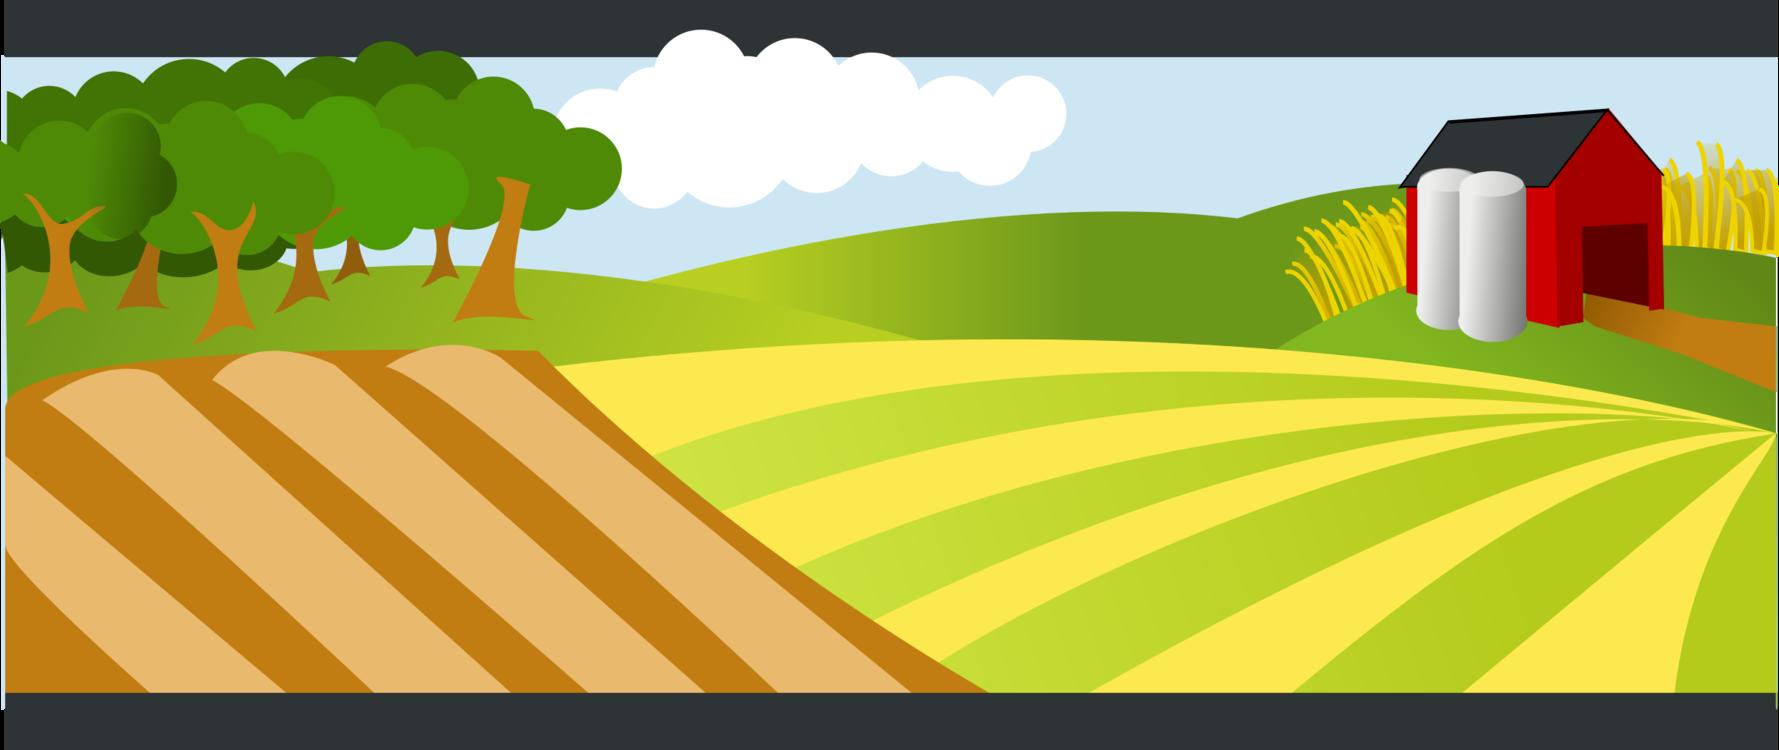 Farm clipart agricultural land, Farm agricultural land.